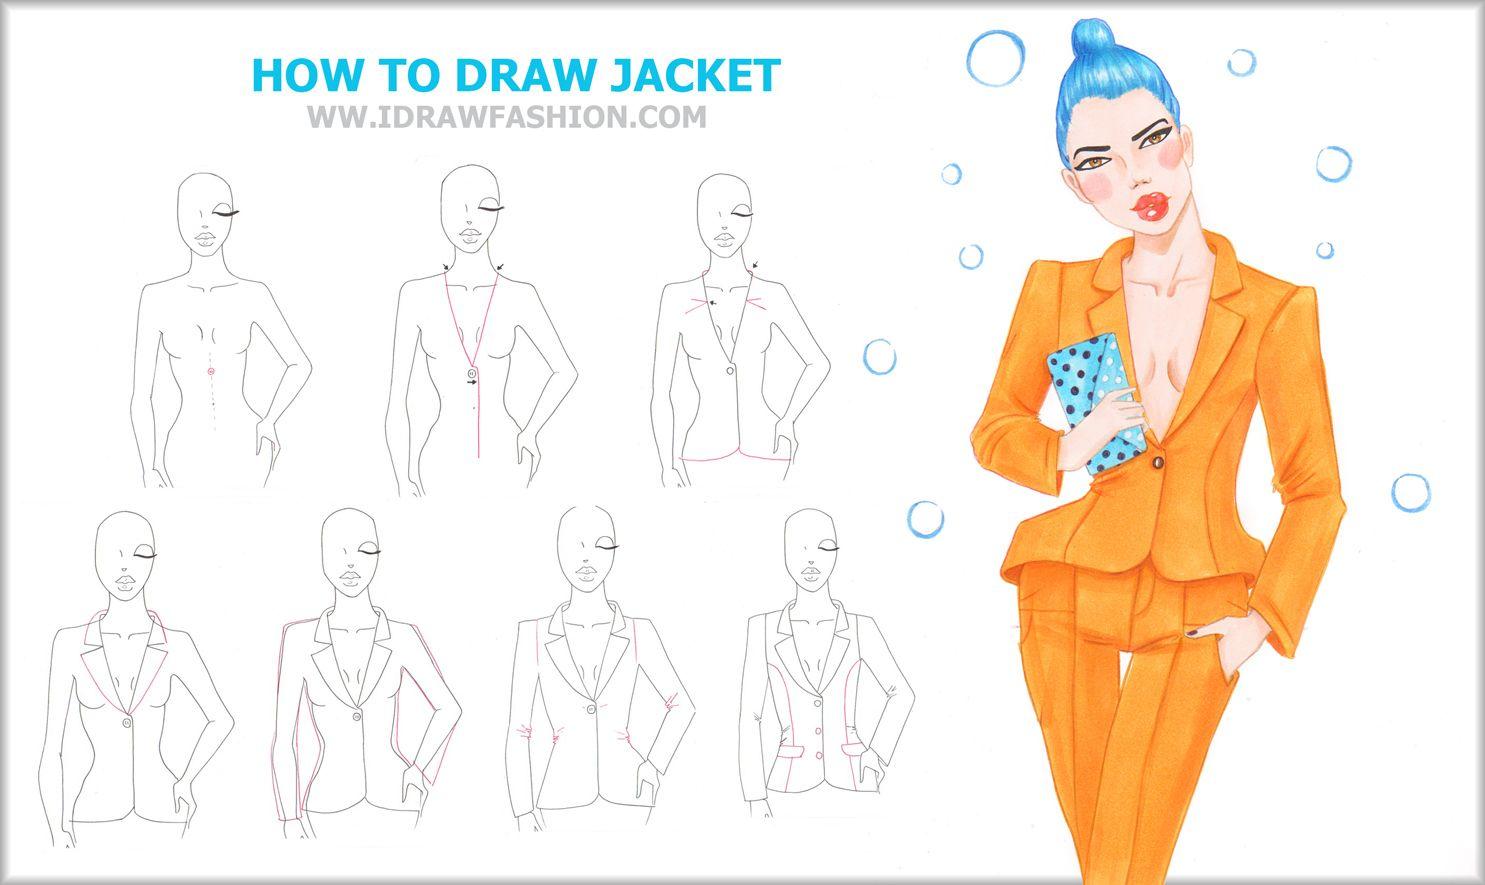 http://www.idrawfashion.com/ Learn how to draw fashion sketches step by step